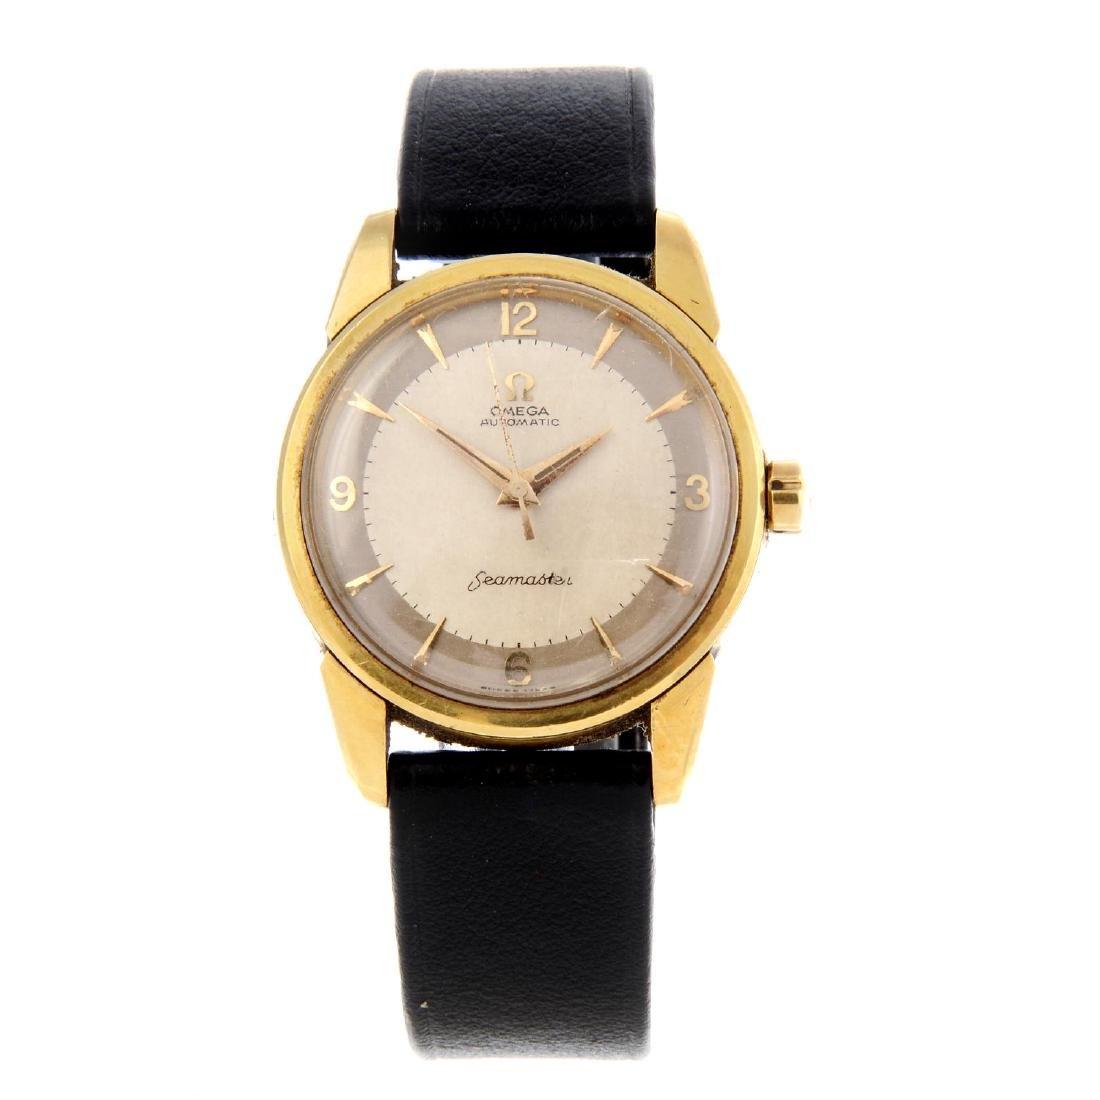 OMEGA - a gentleman's Seamaster wrist watch. 18ct